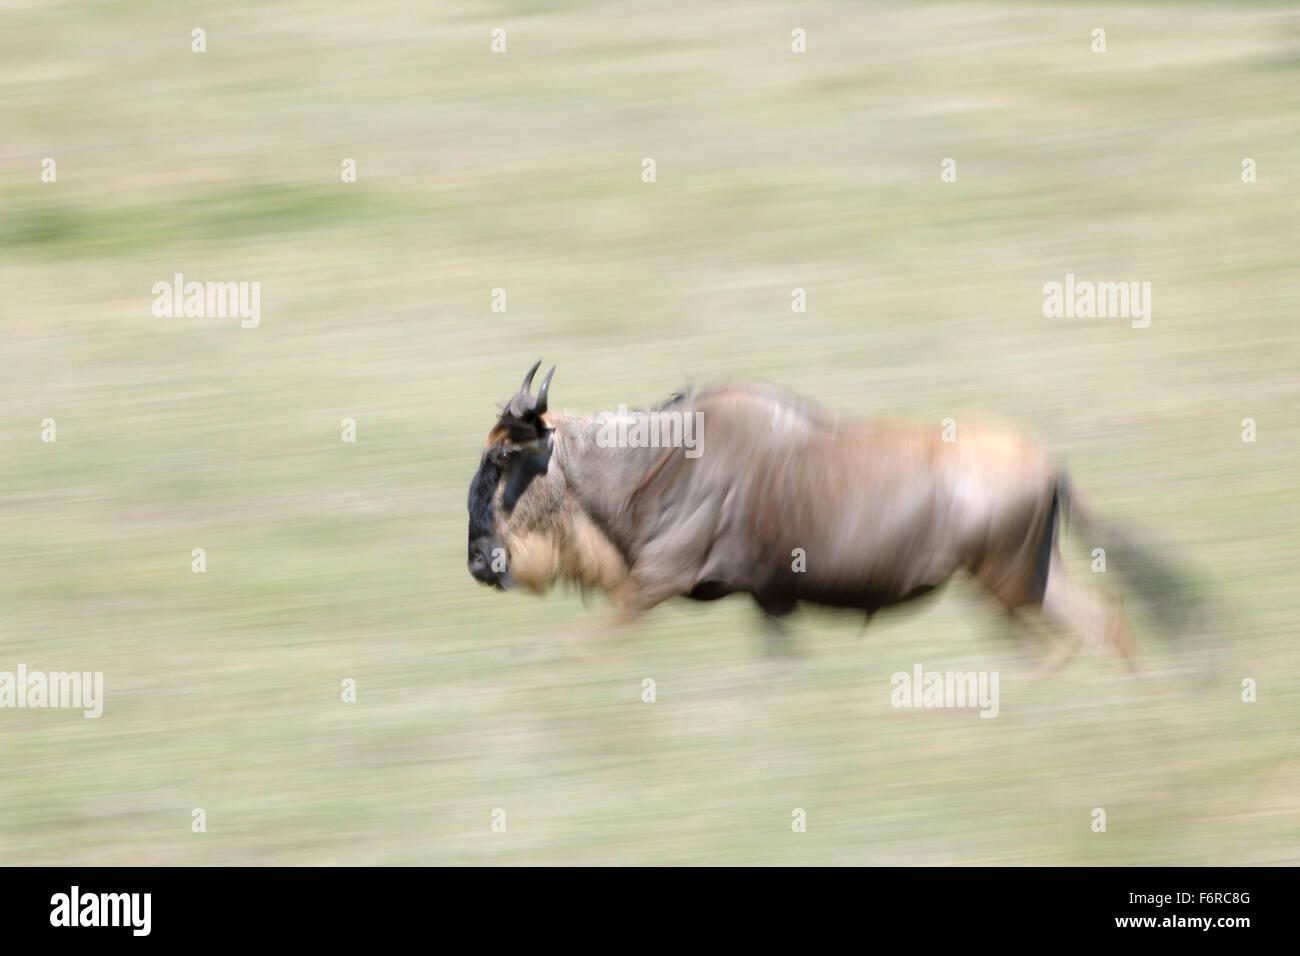 Blue wildebeest, brindled gnu, white-bearded wildebeest (Connochaetes taurinus), running, with motion blur, Serengeti - Stock Image